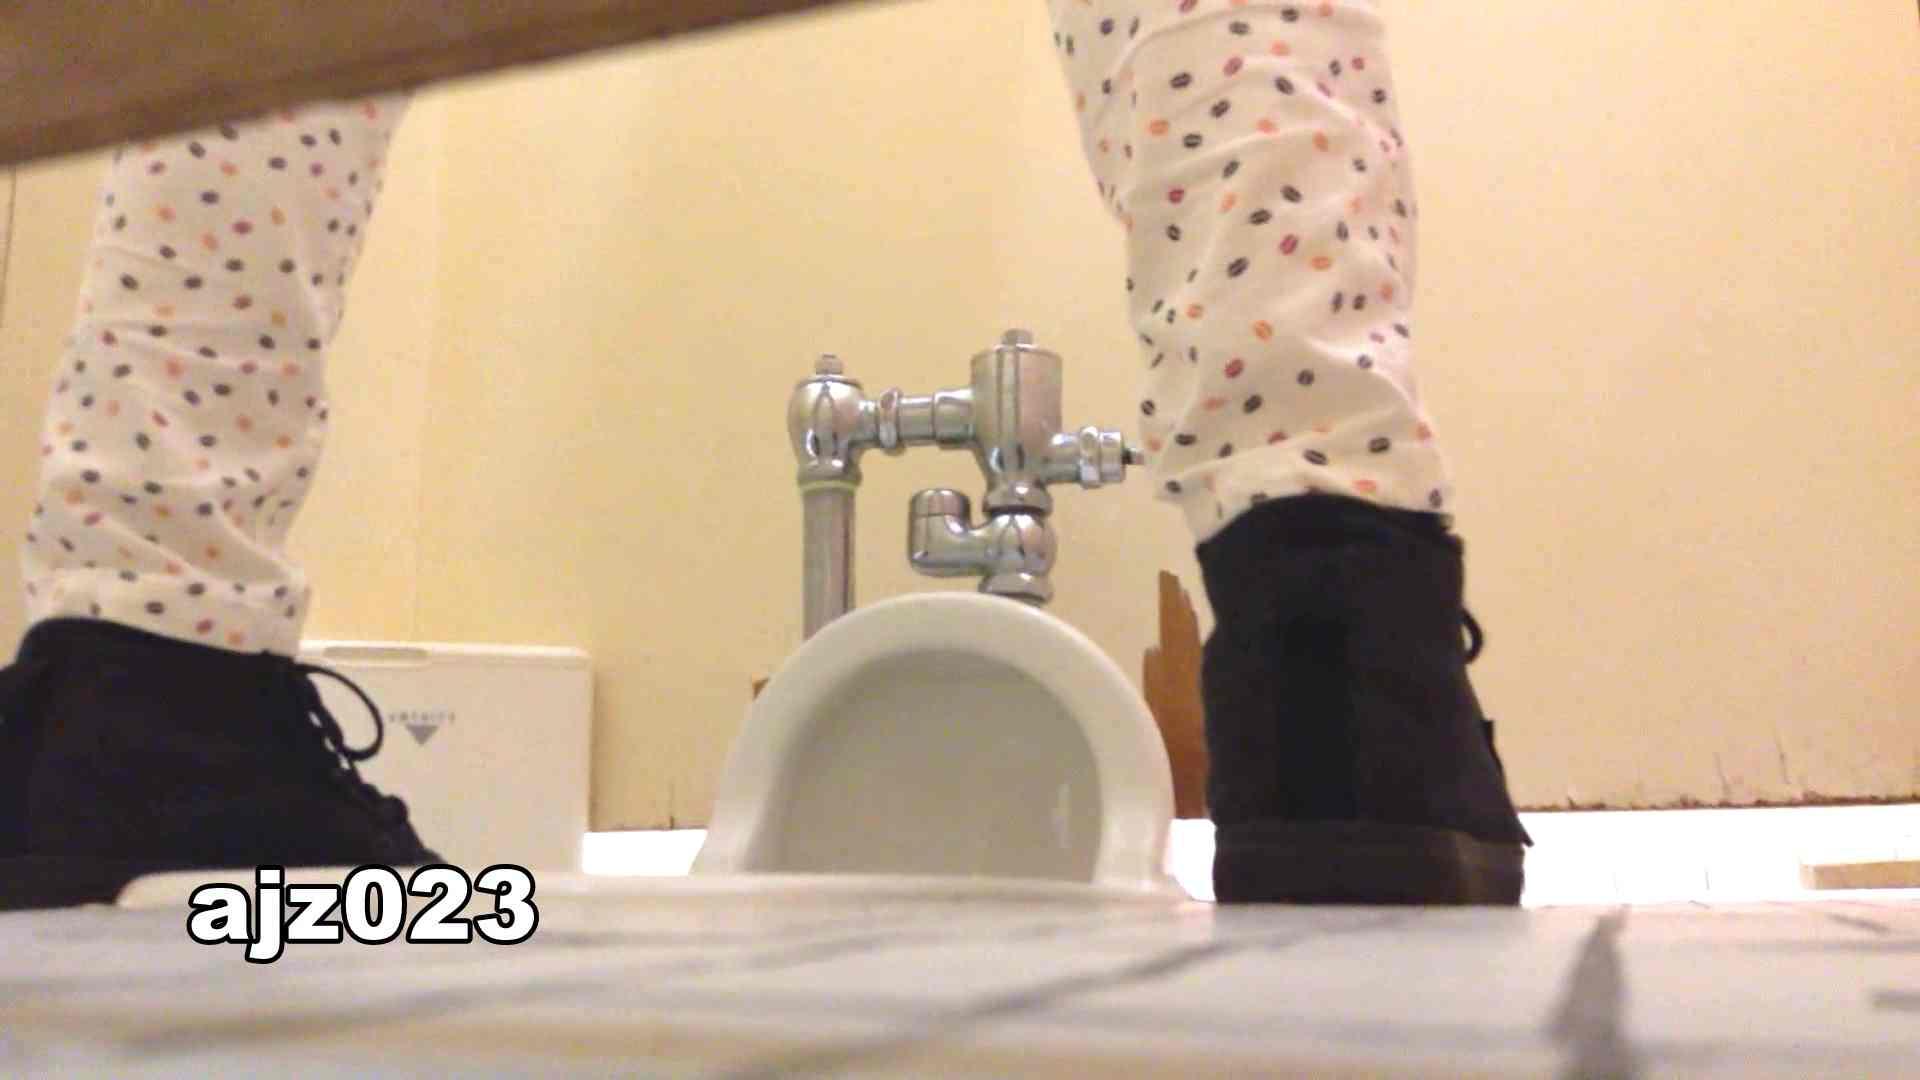 某有名大学女性洗面所 vol.23 洗面所 隠し撮りオマンコ動画紹介 101画像 95